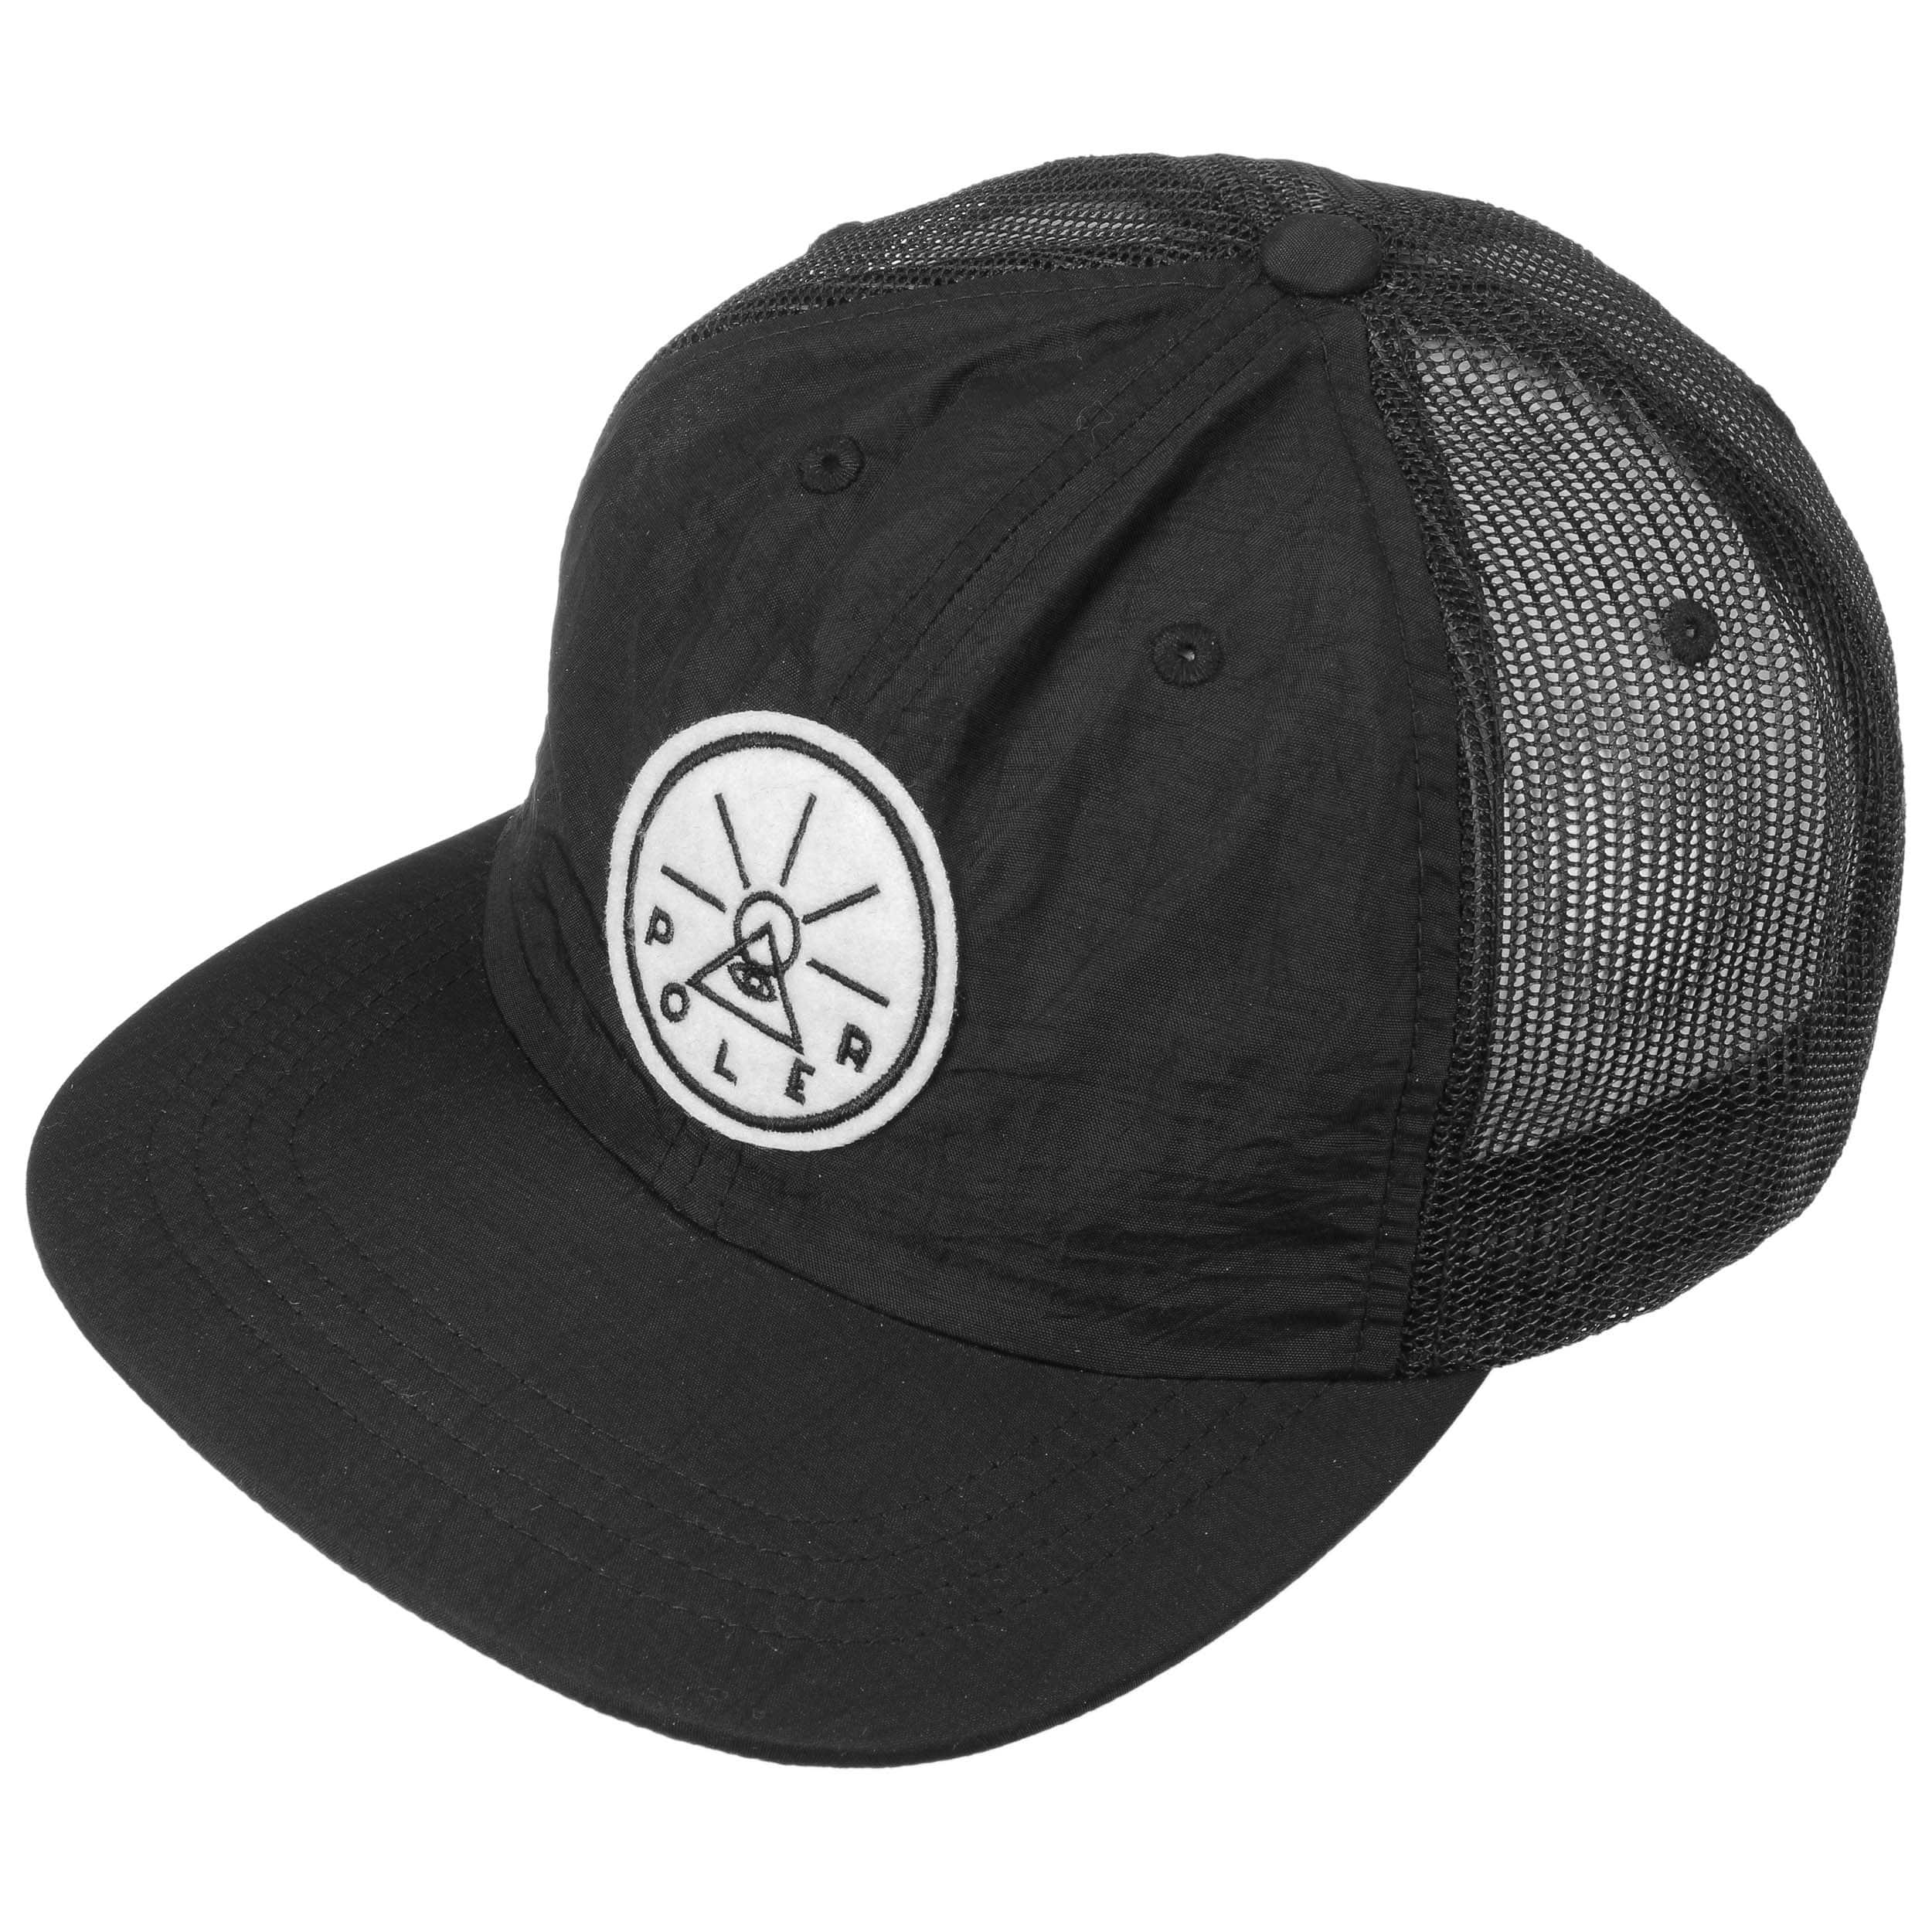 ... Golden Circle Trucker Cap by Poler - black 1 ... 7c6a004f583